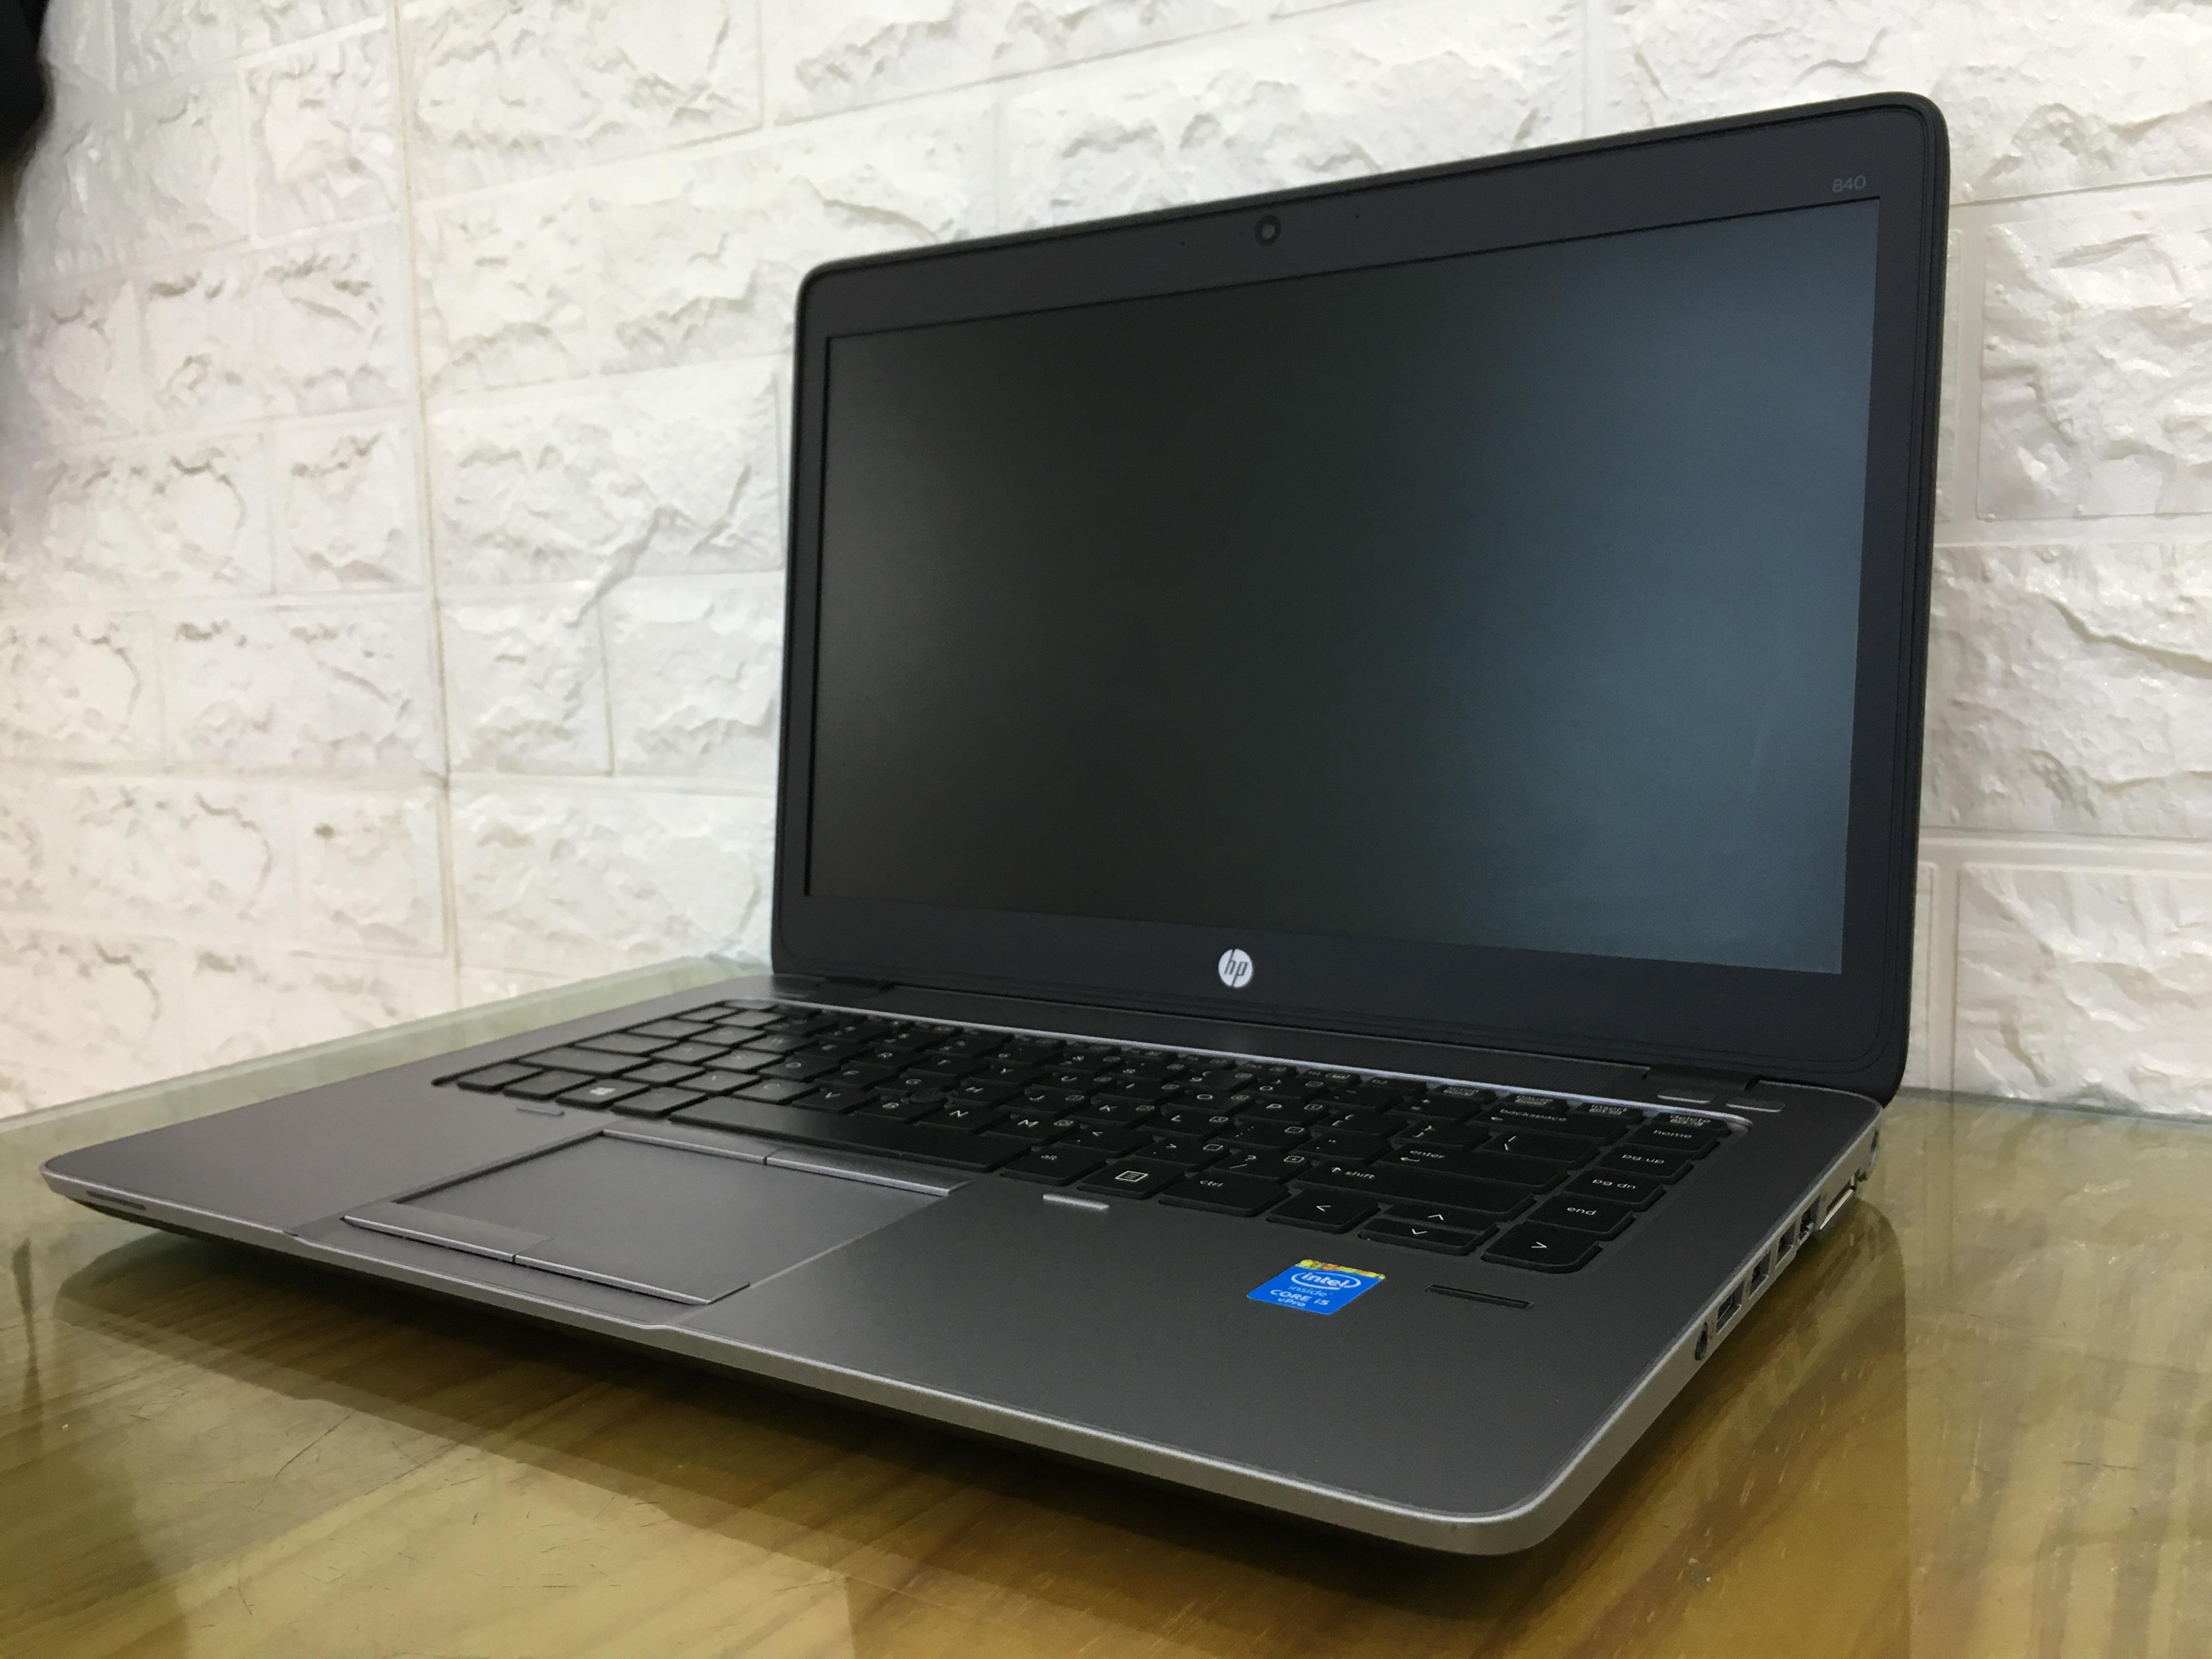 HP Elitebook 840 G1: i5-4300U   RAM 4GB   SSD 128GB   Màn hình 14 inches HD